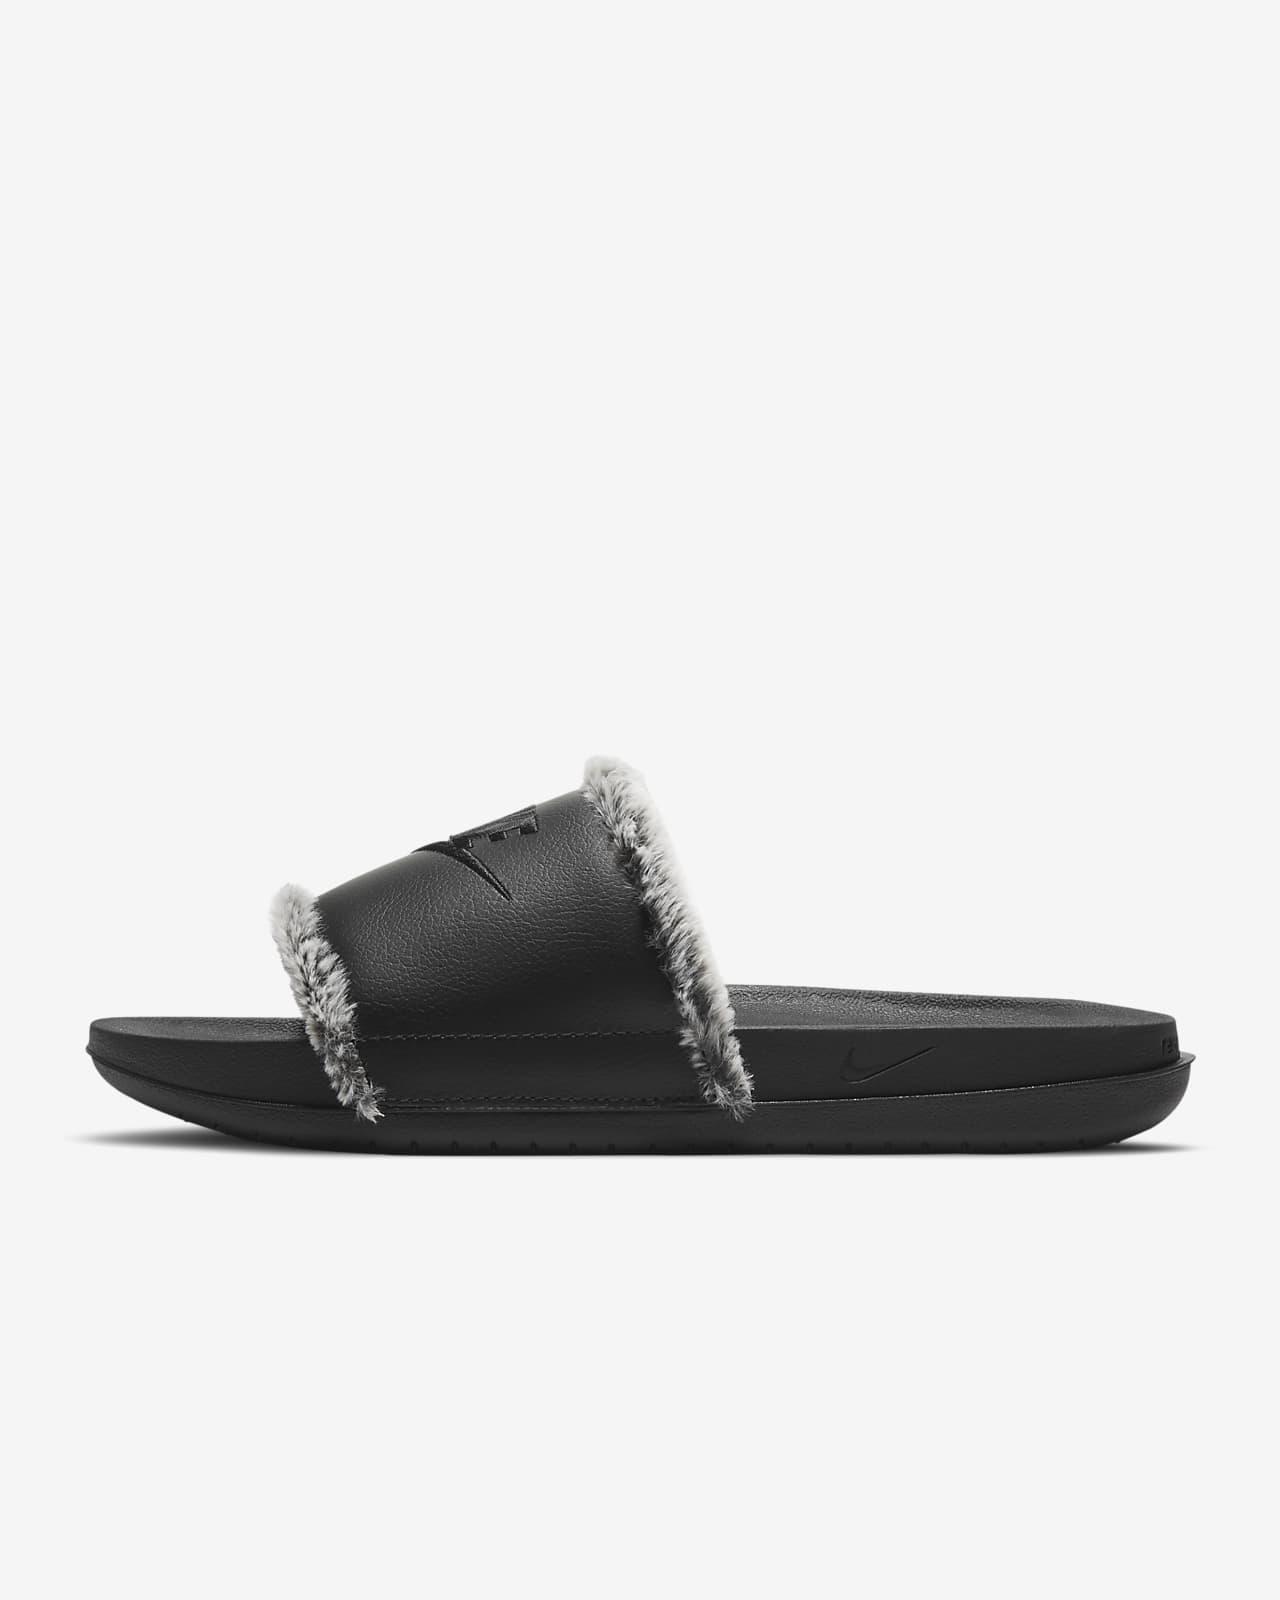 Nike OffCourt Leather Women's Slide